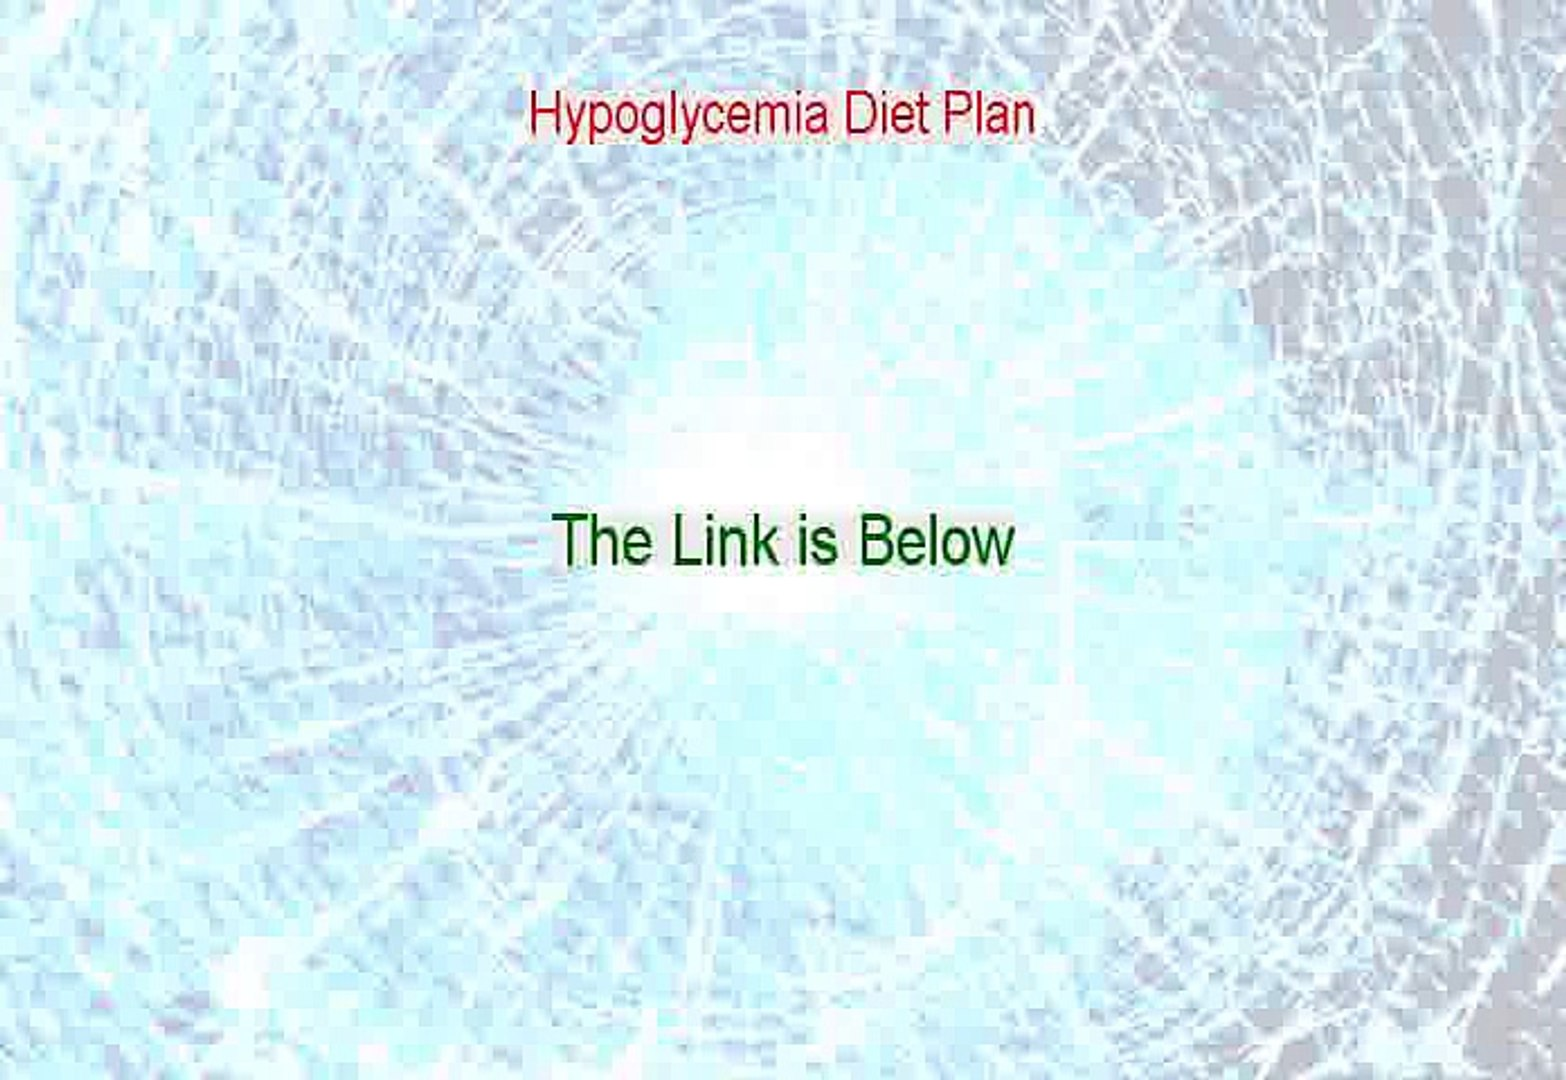 Hypoglycemia Diet Plan Free PDF - hypoglycemia diet plan without diabetes 2015